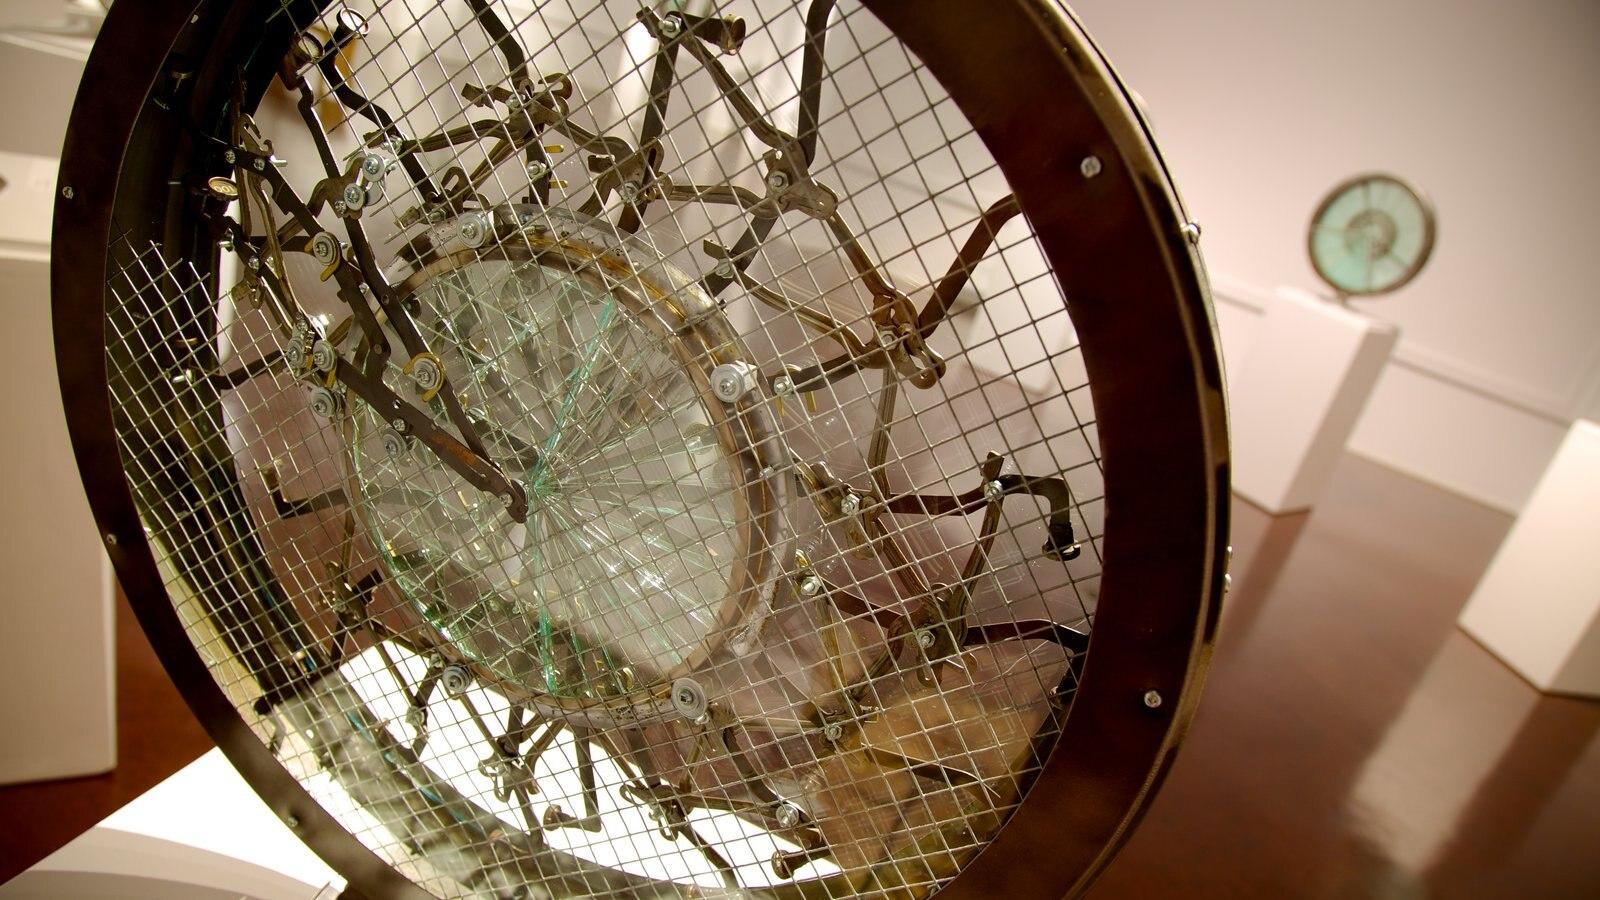 Kootenay Gallery featuring interior views and art